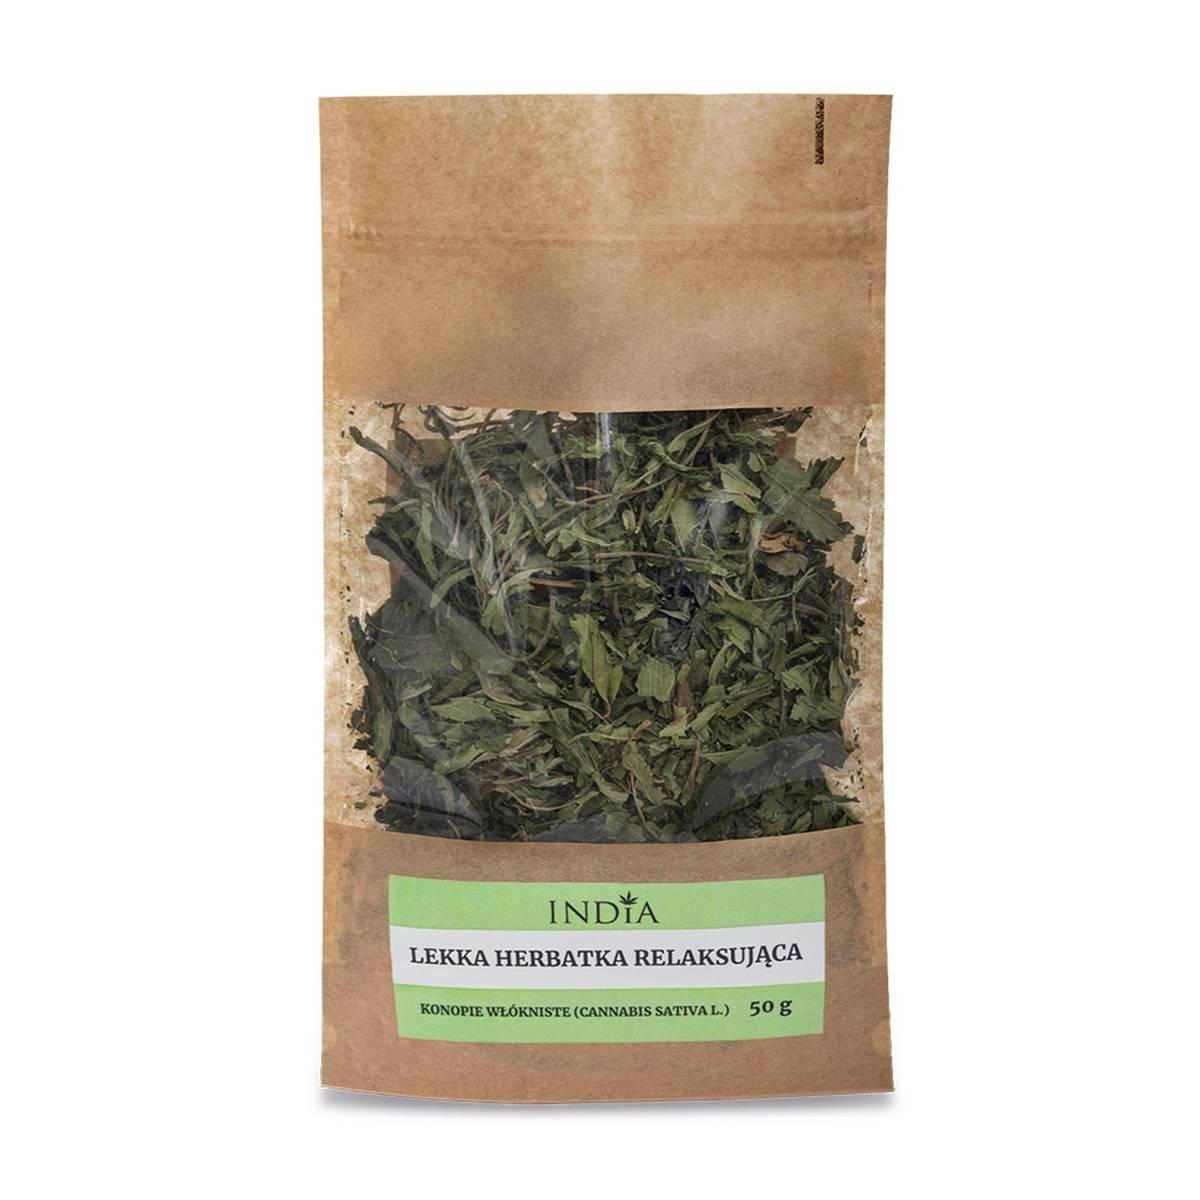 India Lekka herbatka relaksująca 50 g